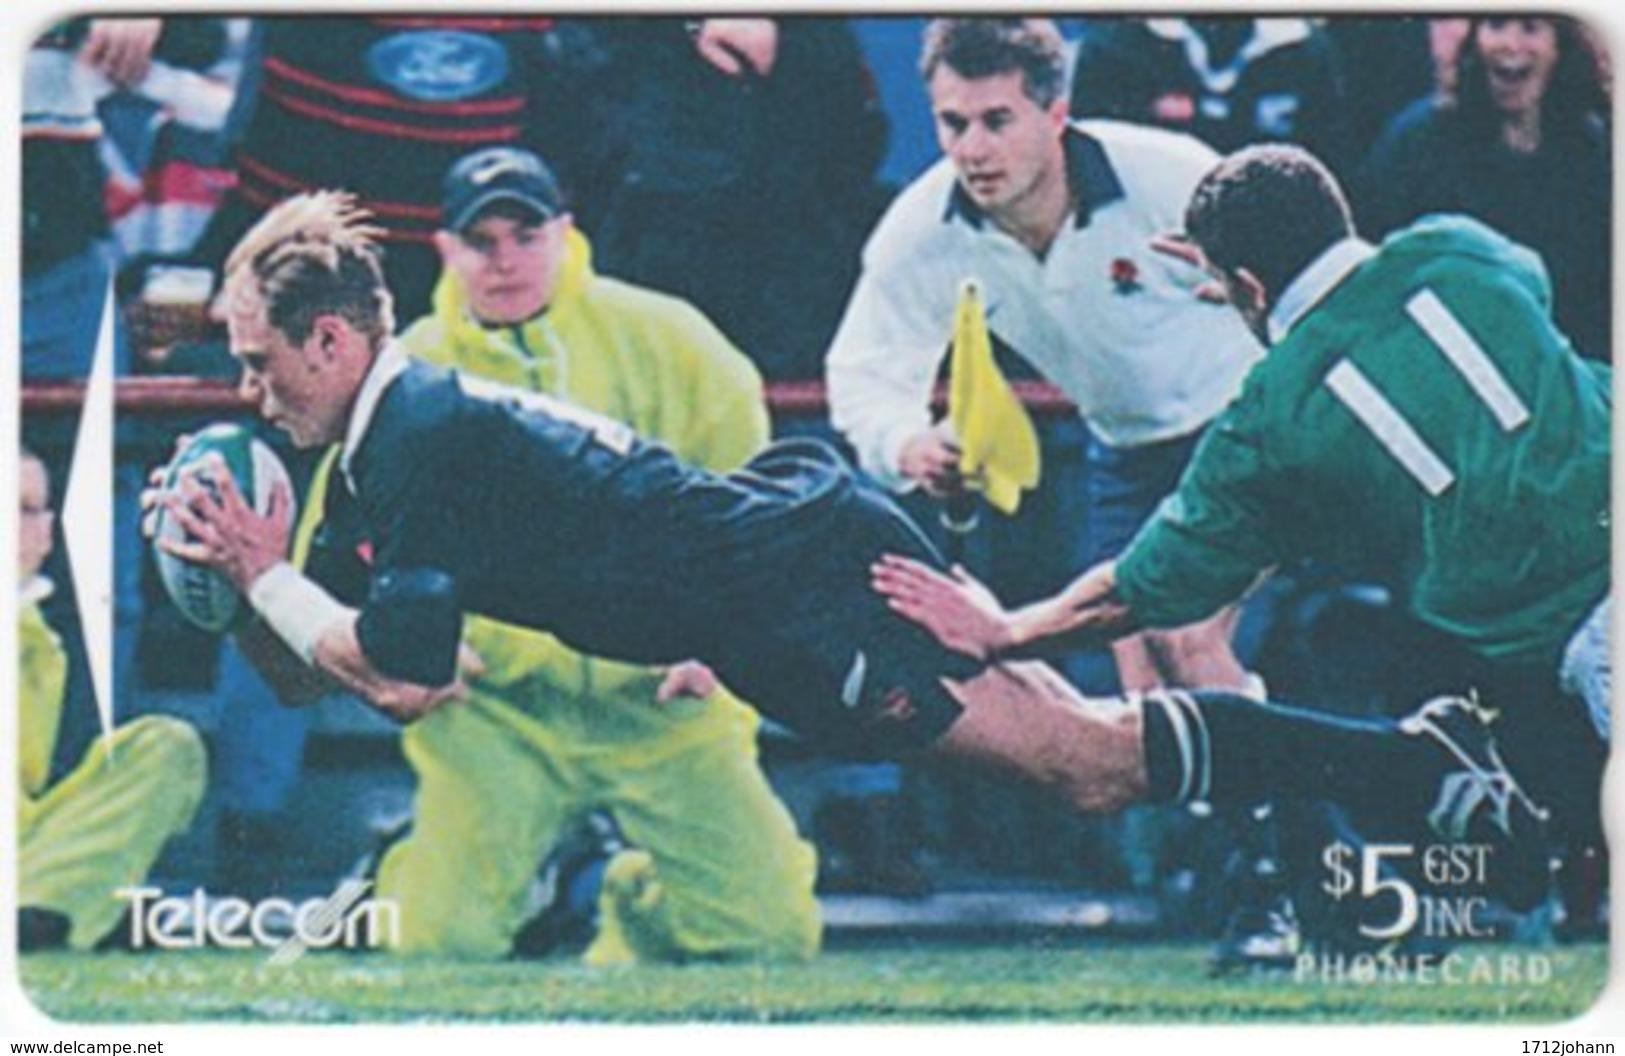 NEW ZEALAND A-765 Magnetic Telecom - Sport, Rugby - ADCB - Used - Nuova Zelanda